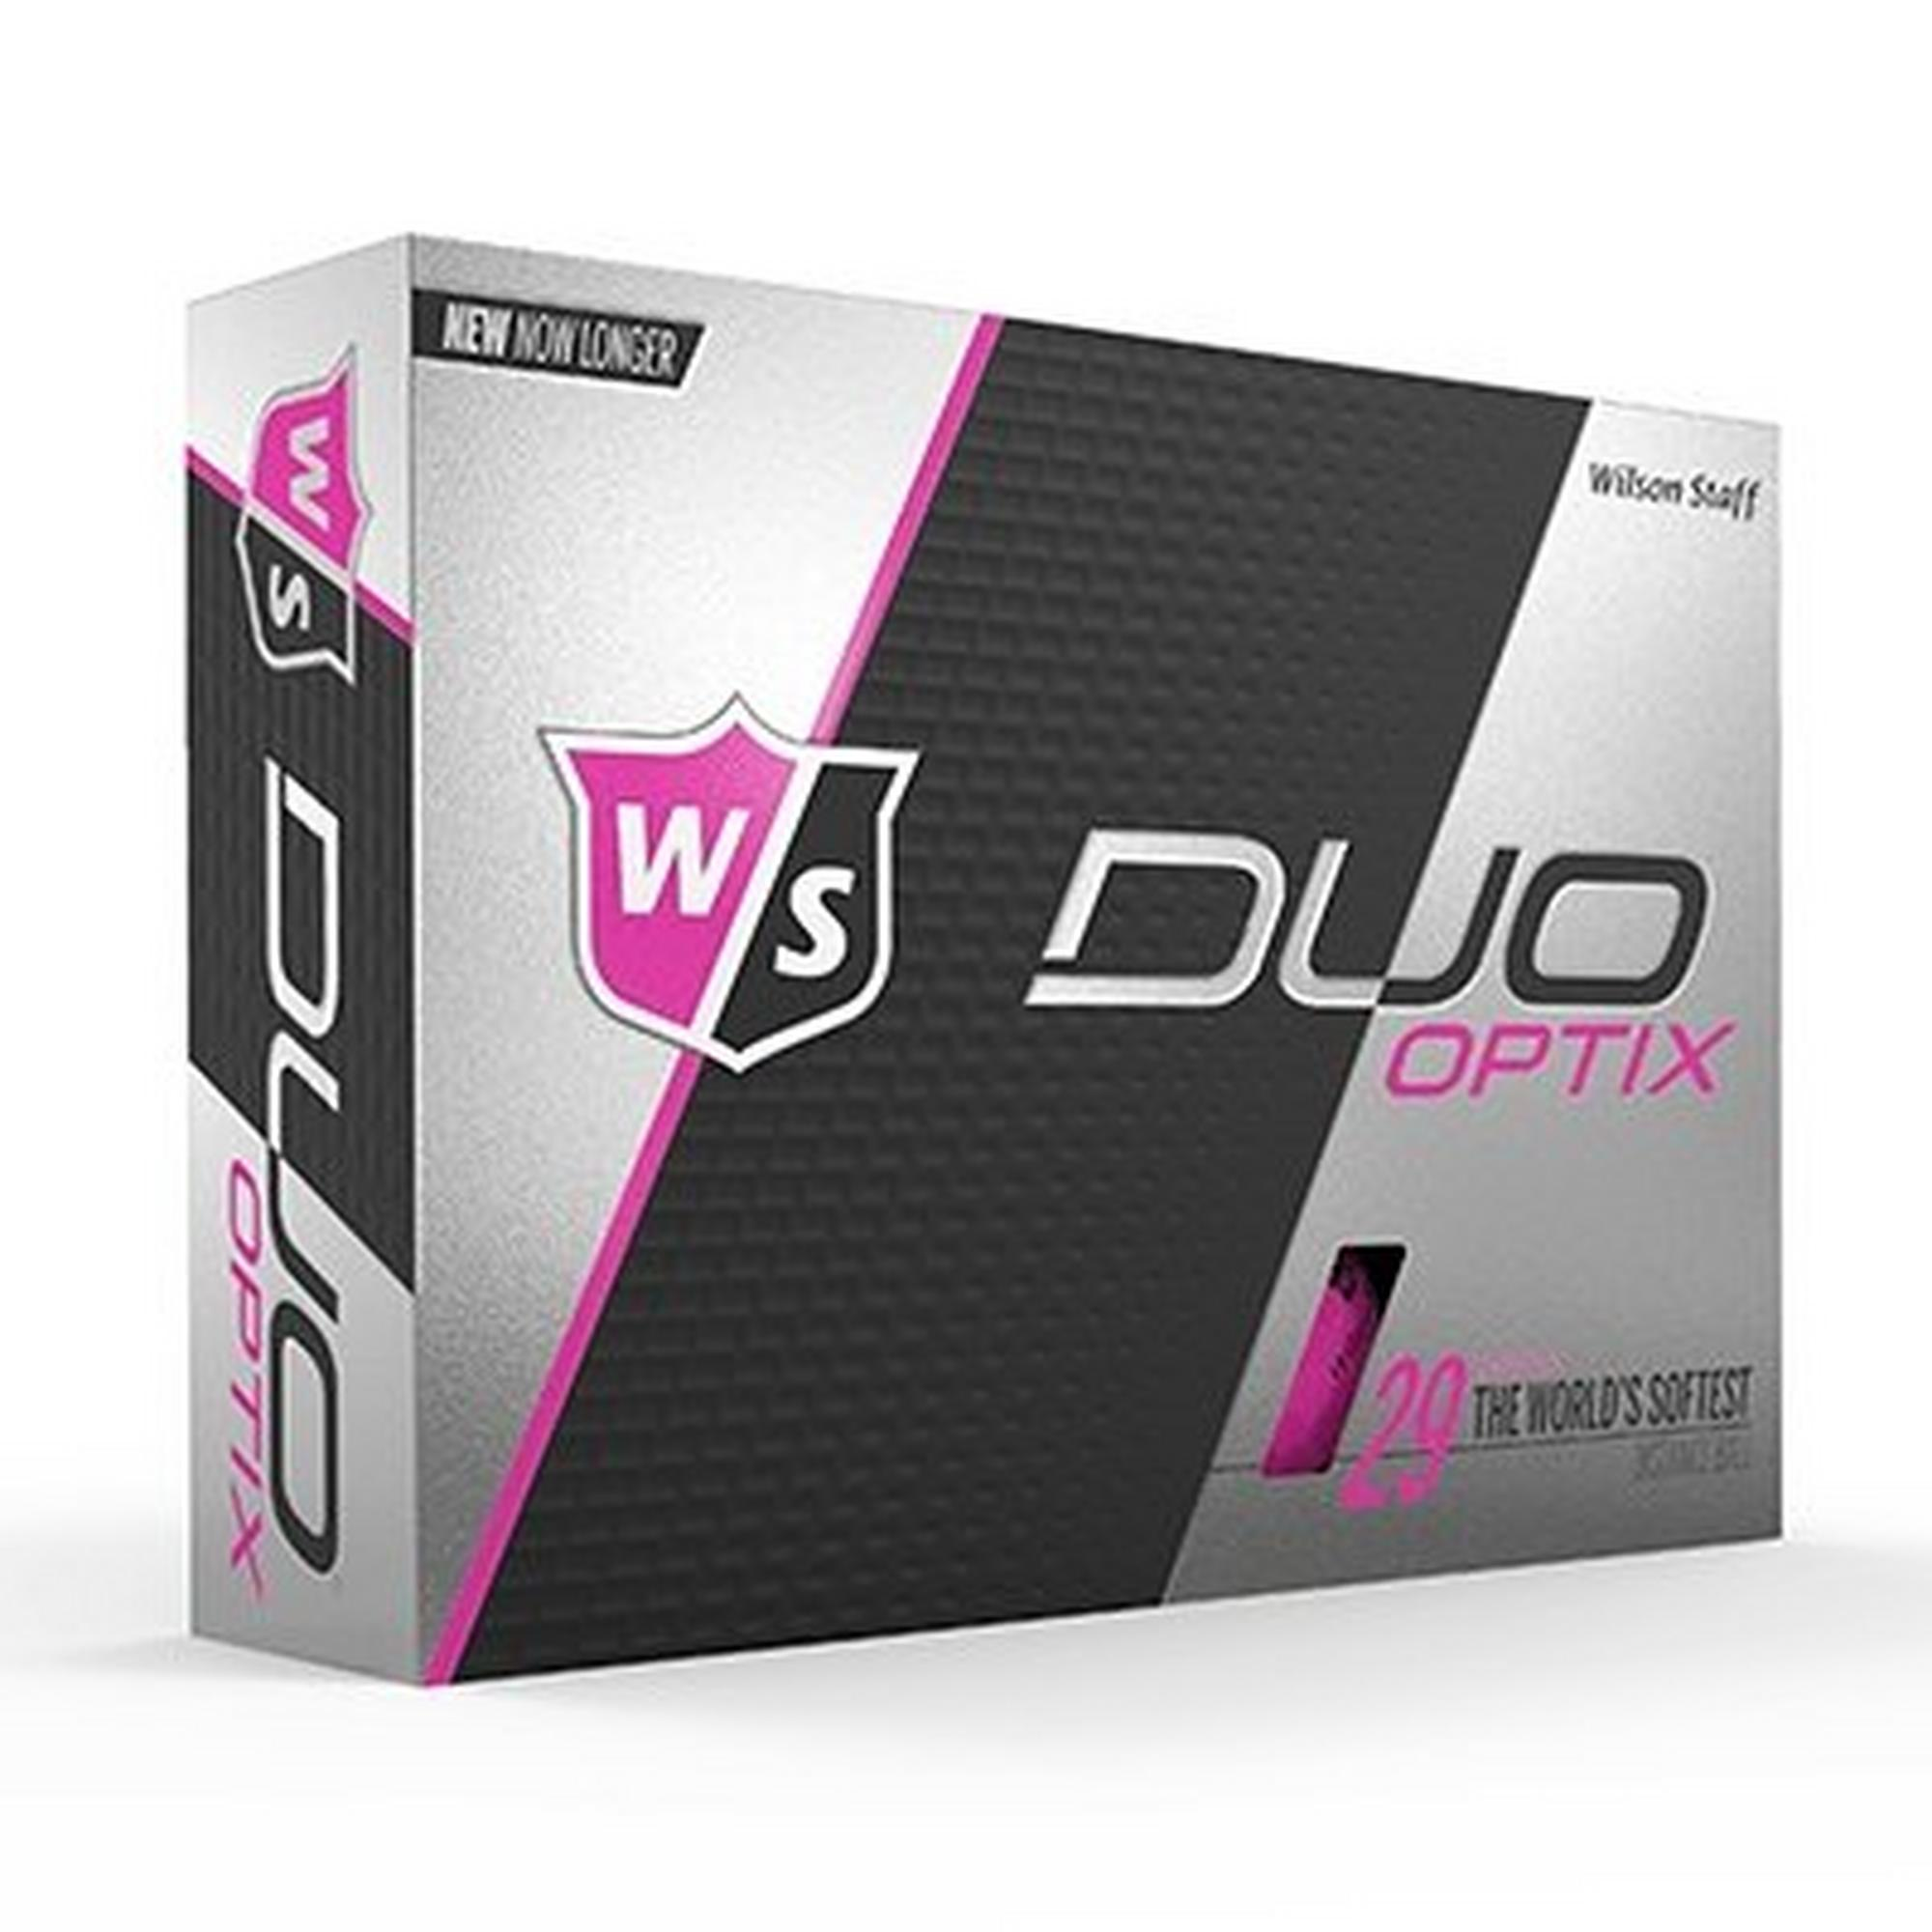 Wilson DUO Optix Golf Balls - Pink